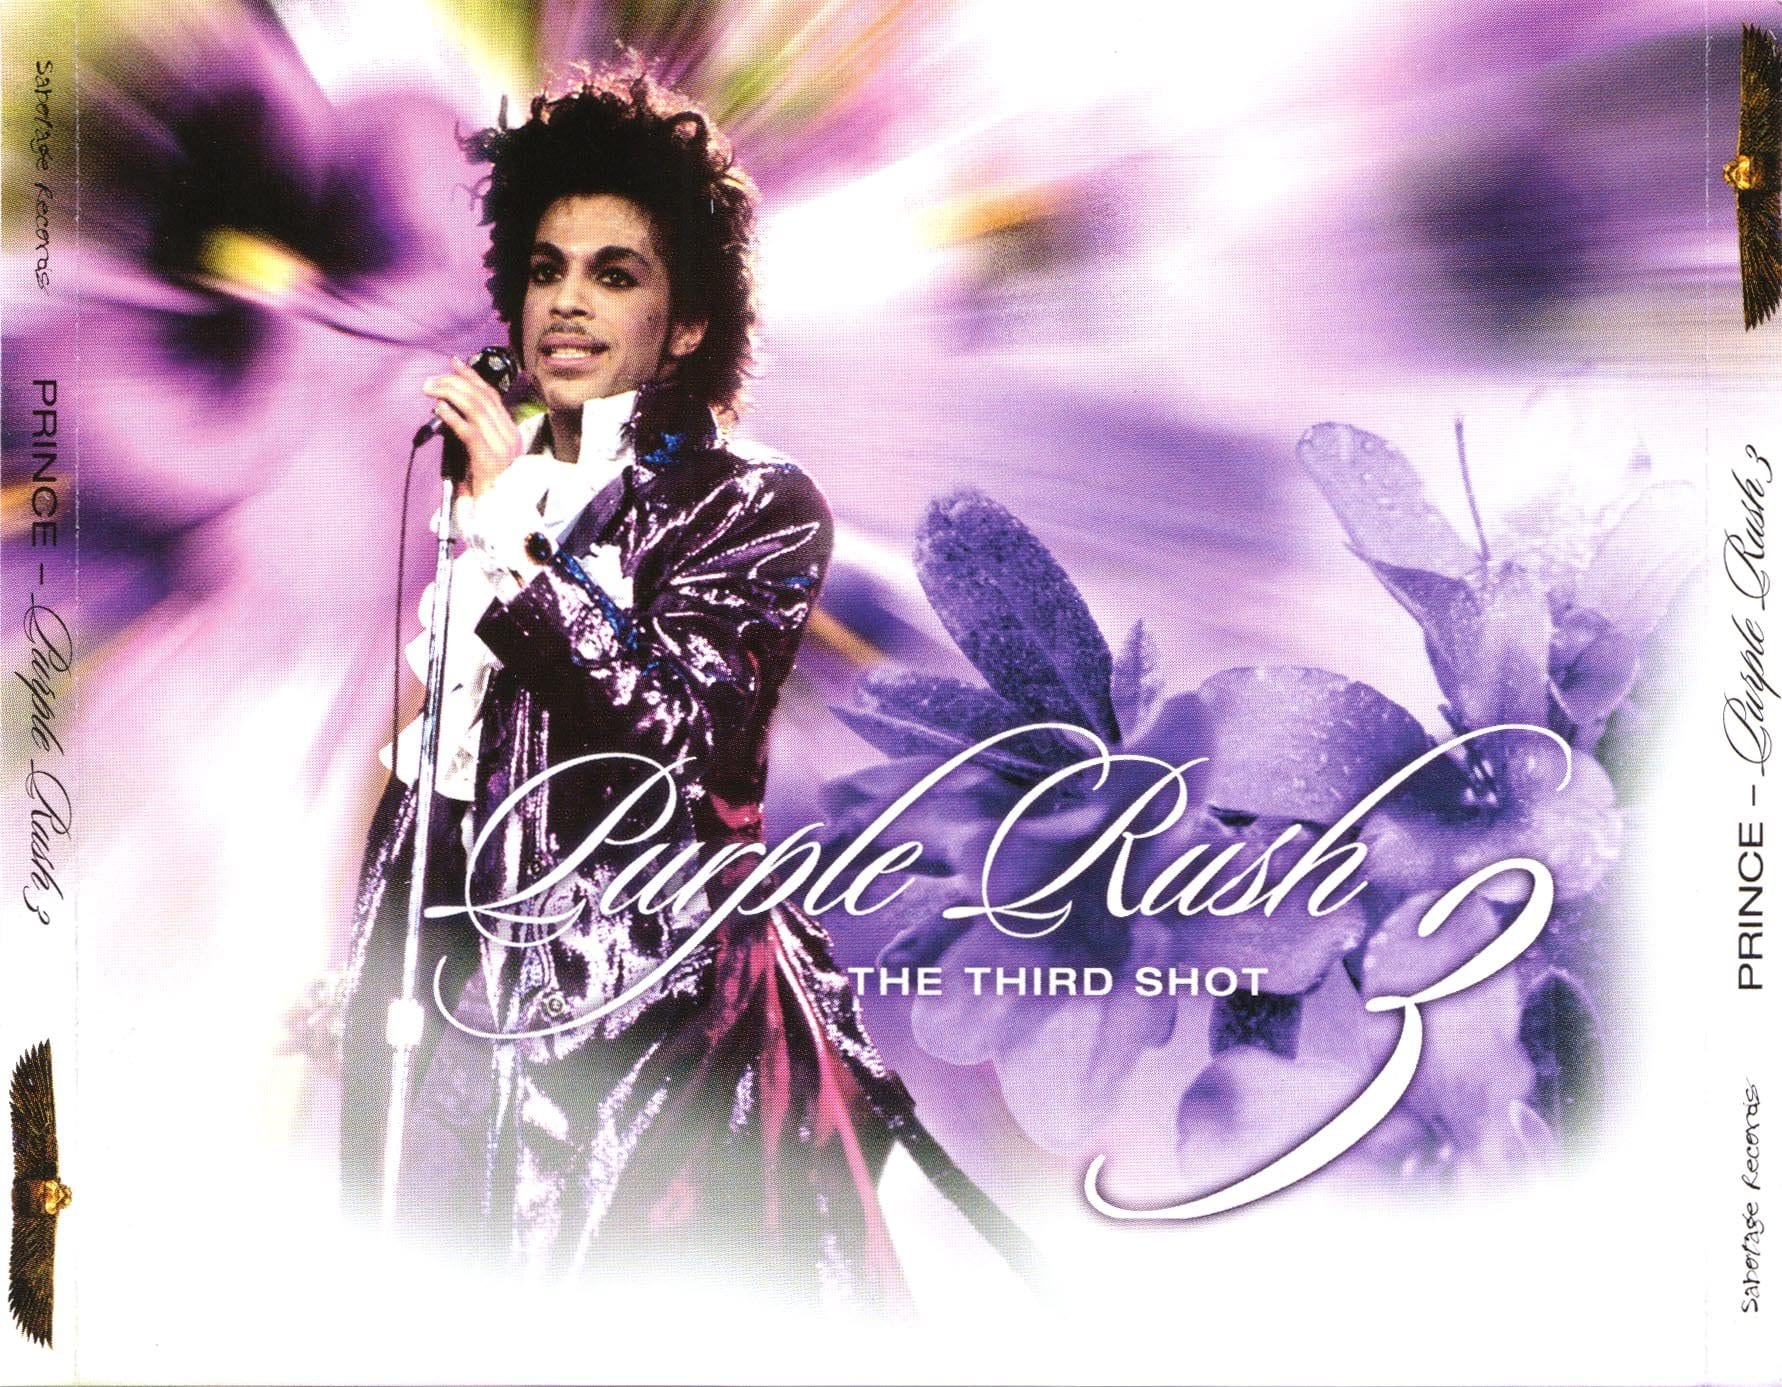 Prince - Purple Rush 3: The Third Shot (Rehearsals 1984) 4 CD SET 8